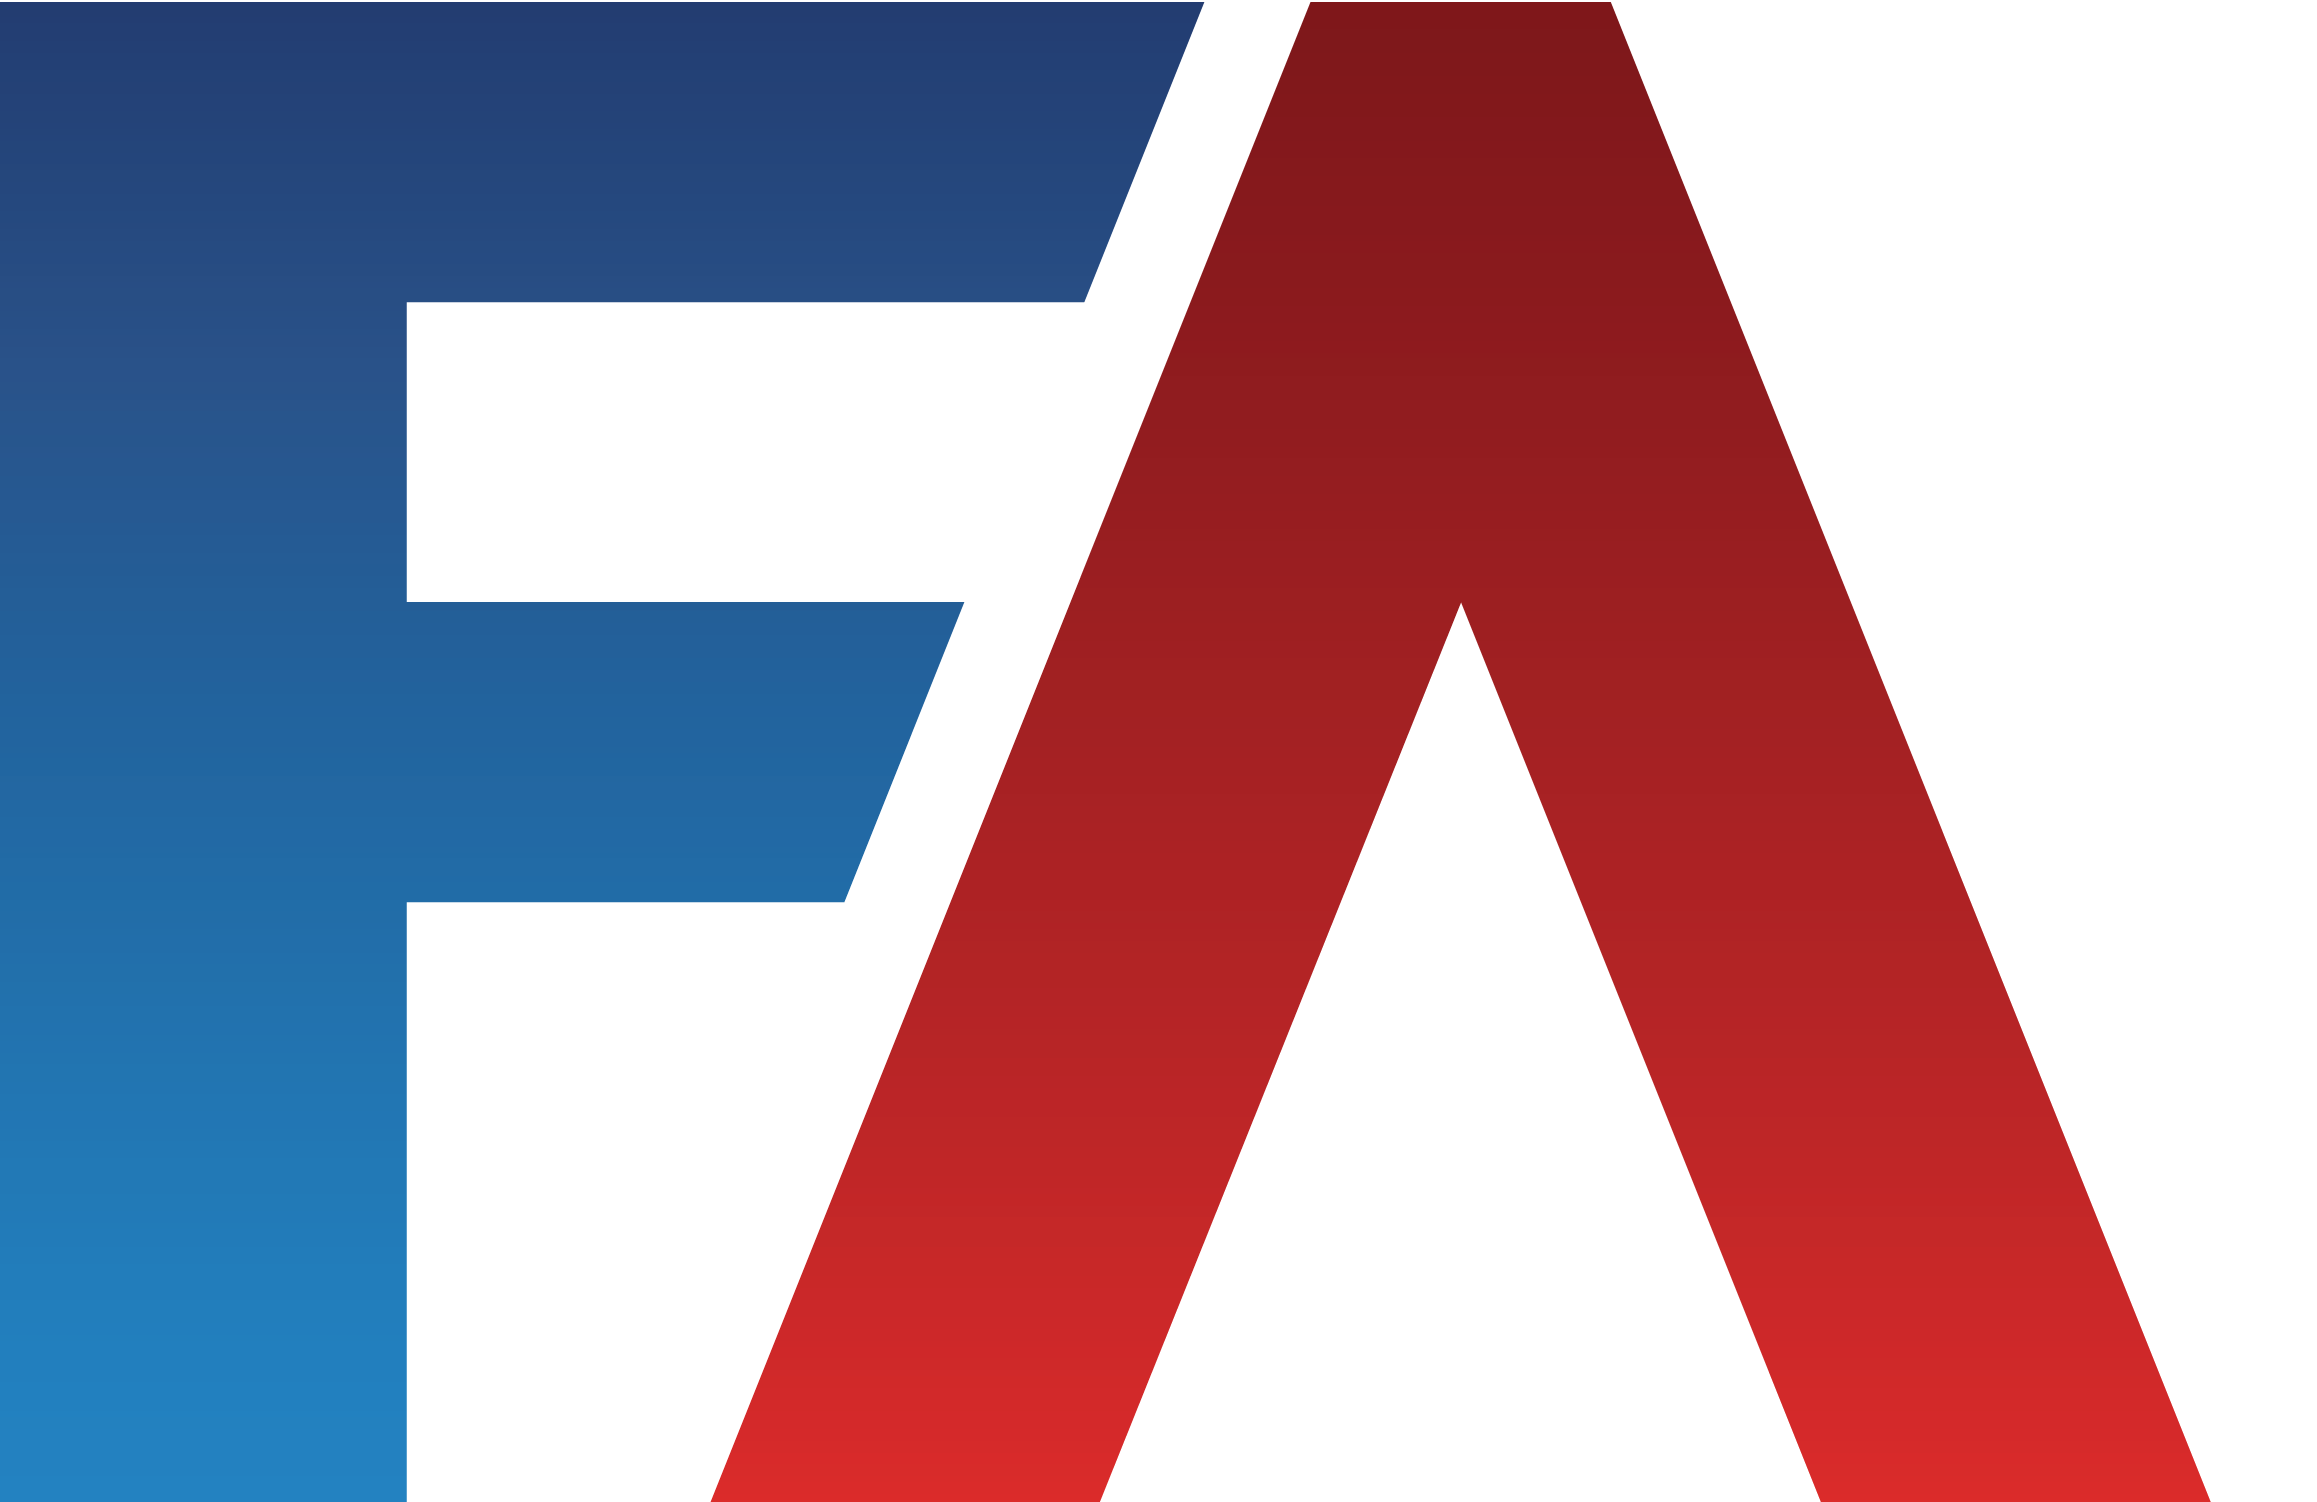 Daniel Munyer - C | FantasyAlarm.com